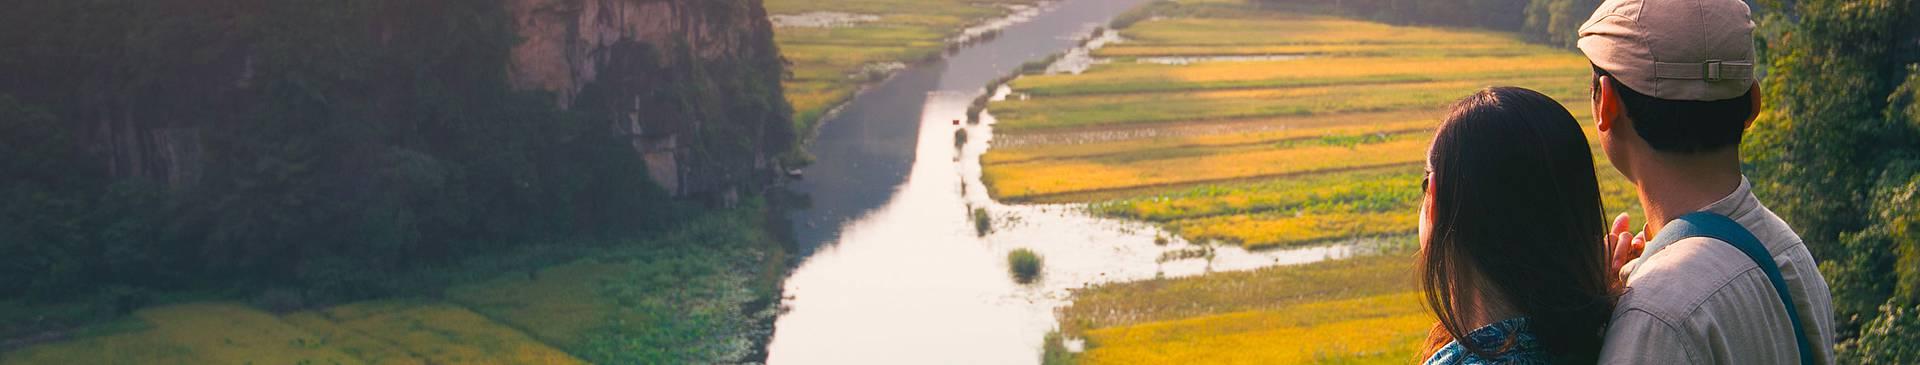 Flitterwochen Vietnam